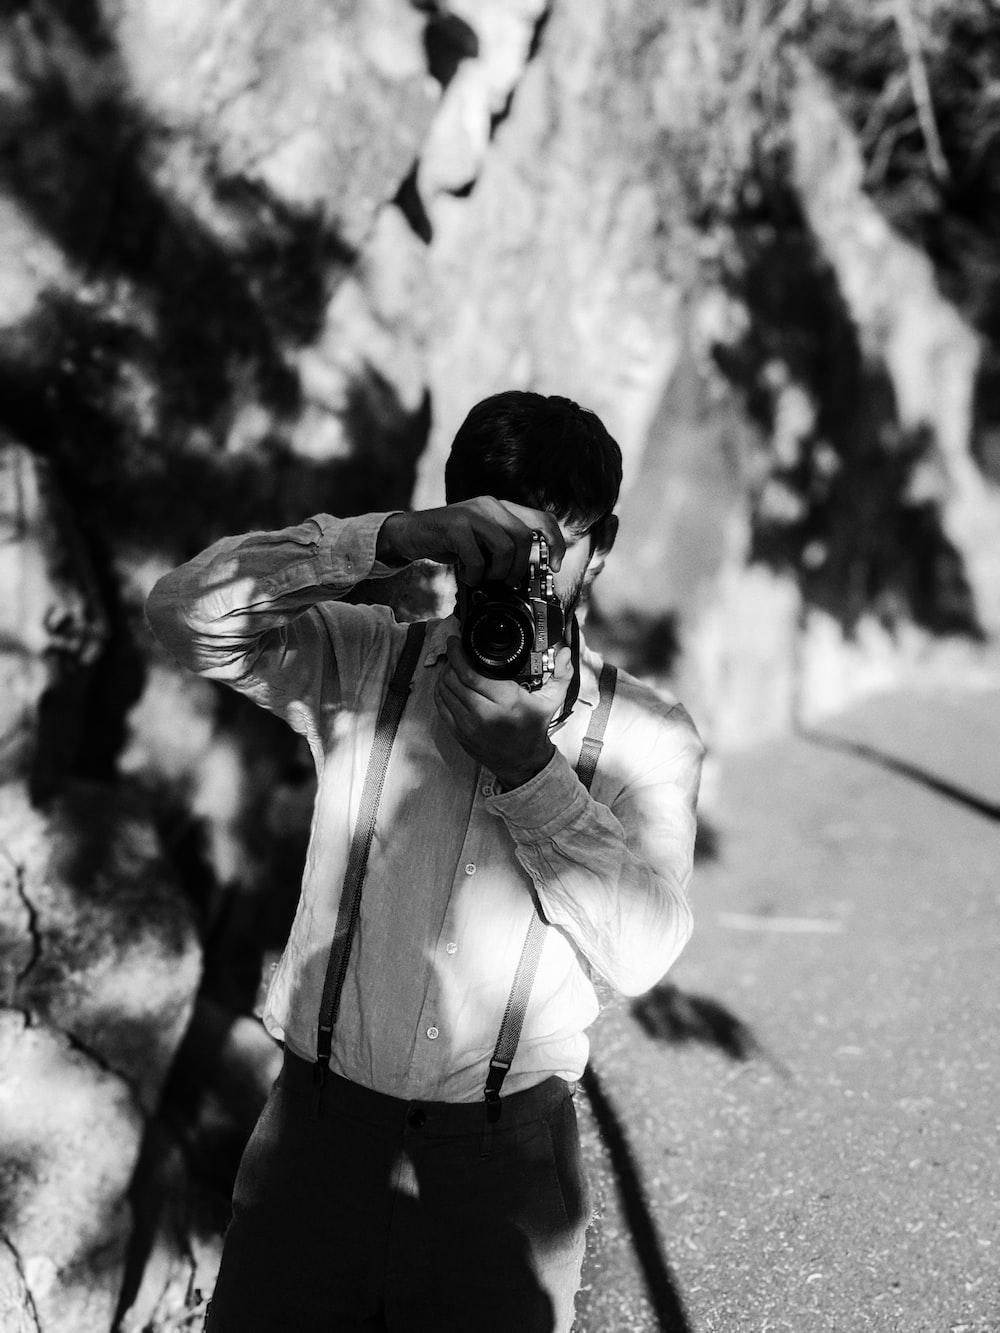 man in white dress shirt holding camera